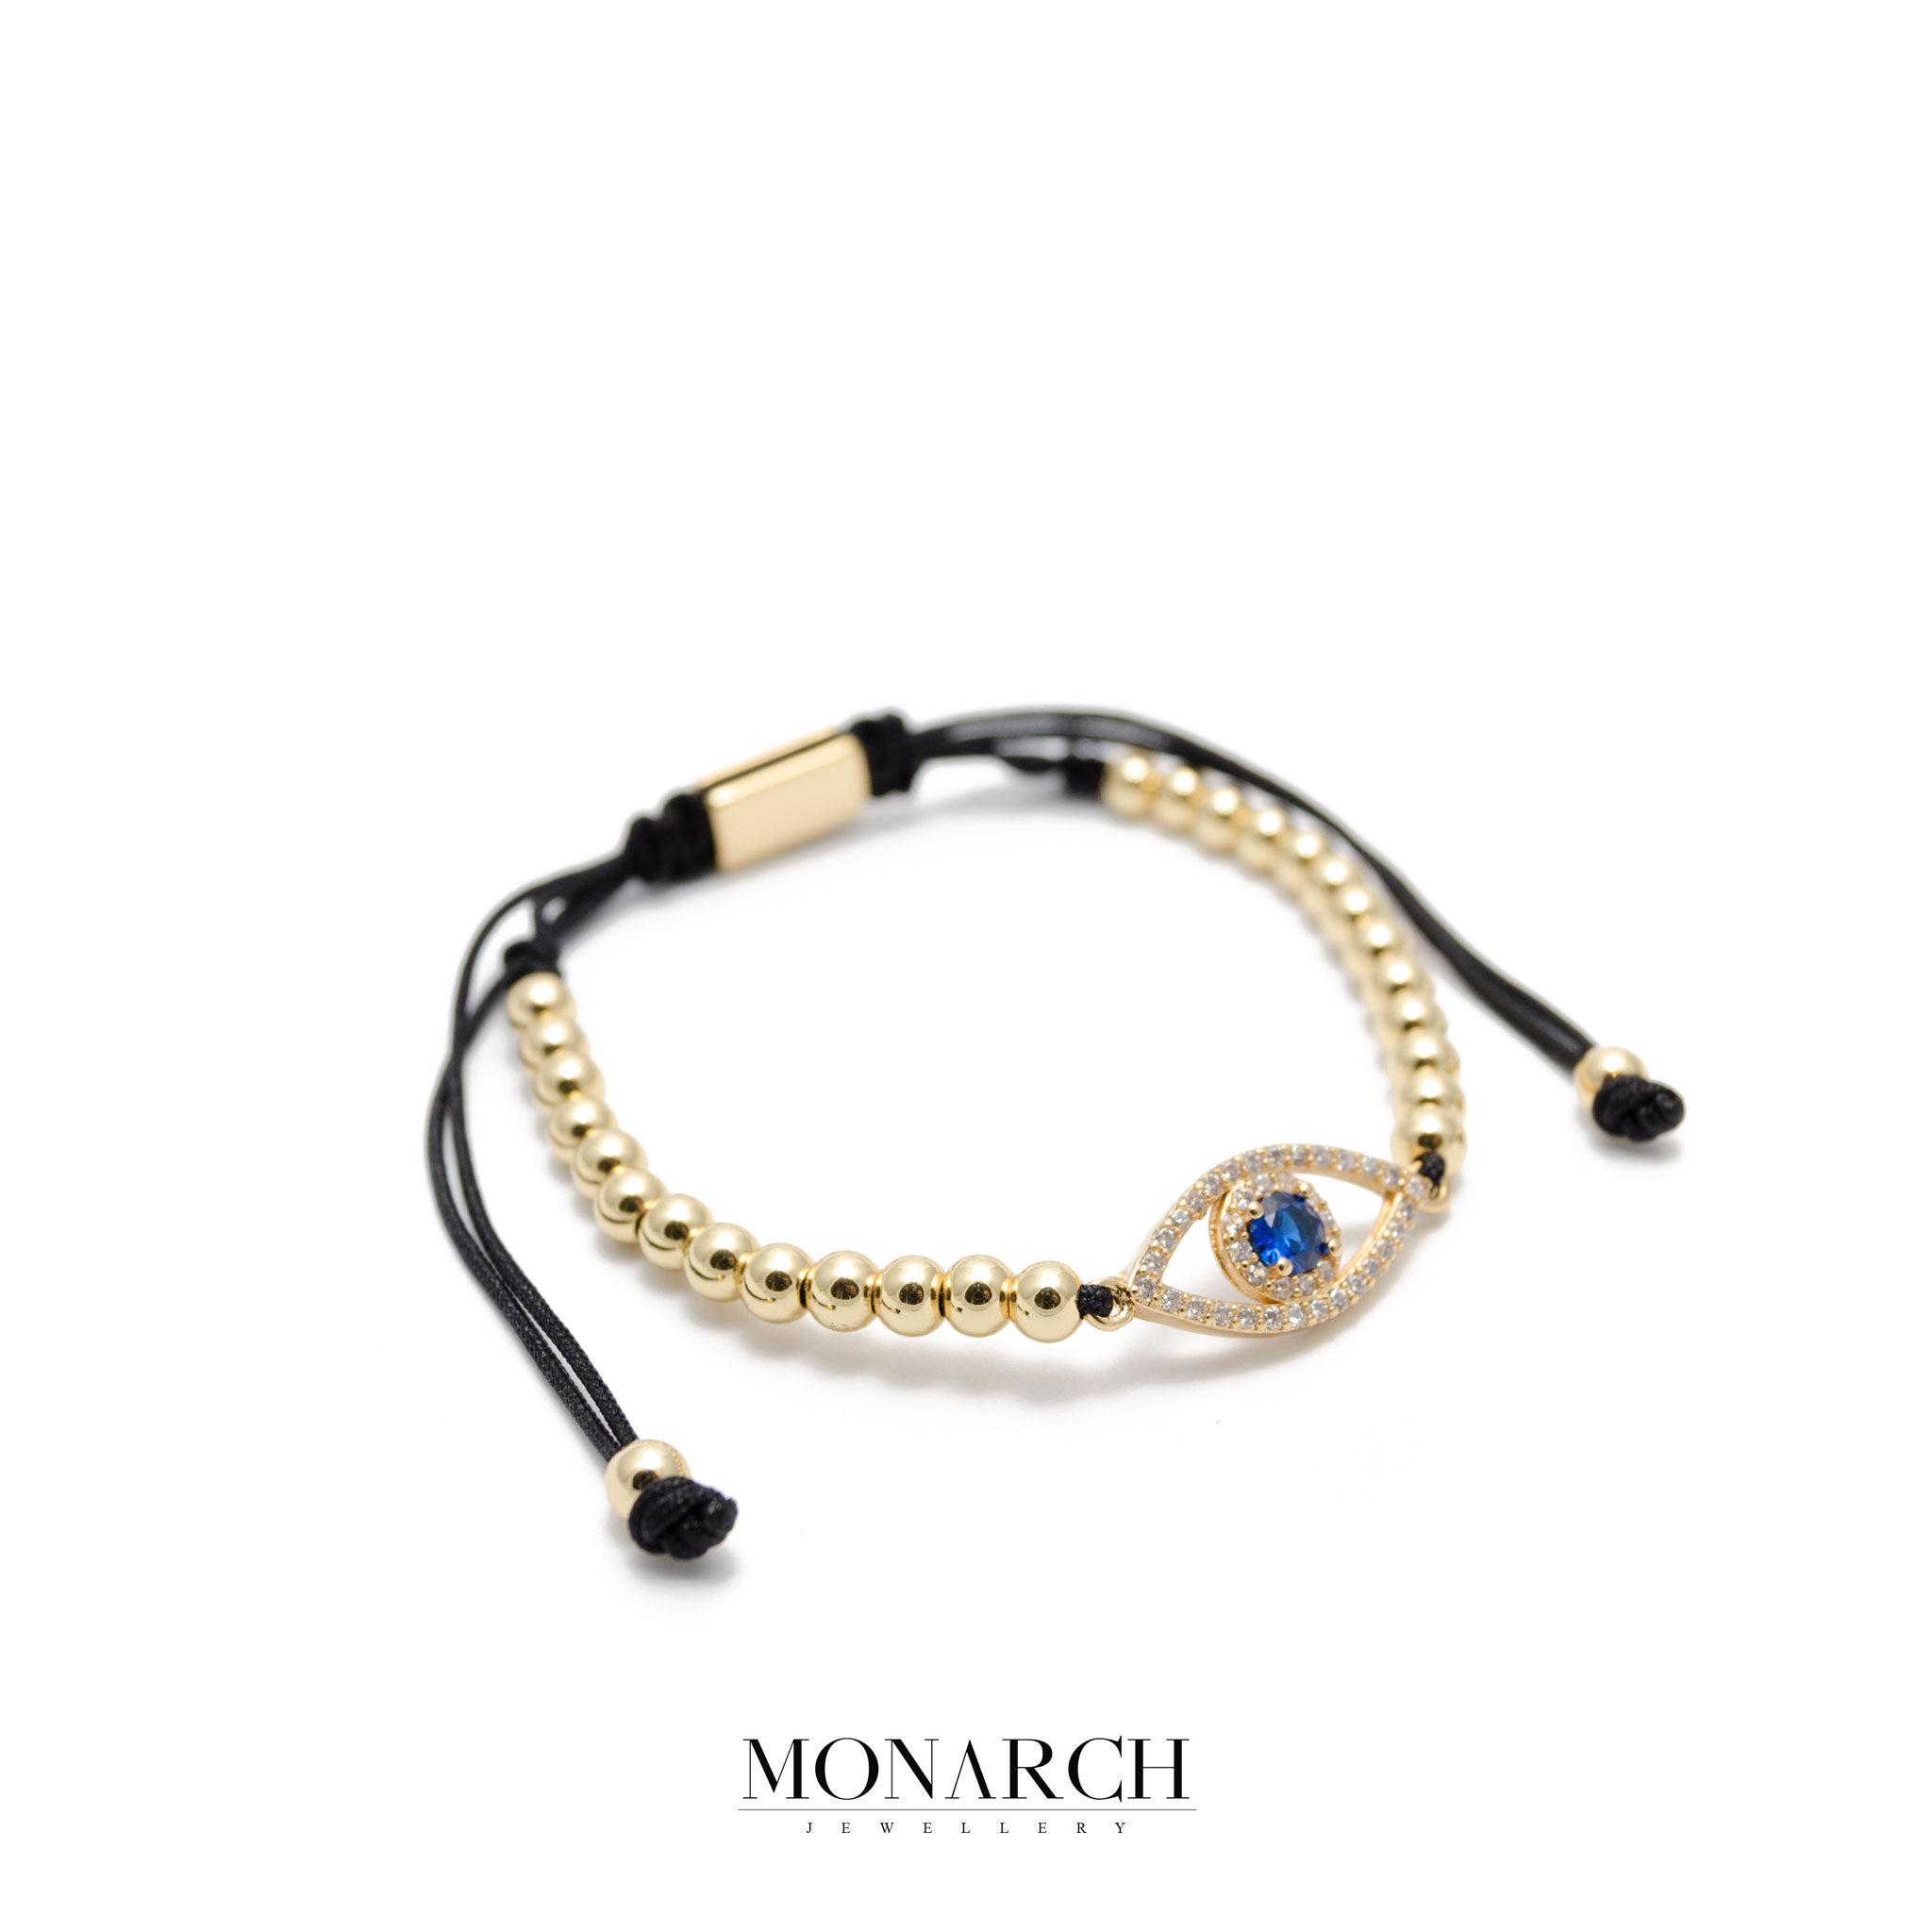 Monarch Jewellery 24k Gold Fatima Eye Charm Luxury Macrame Bracelet